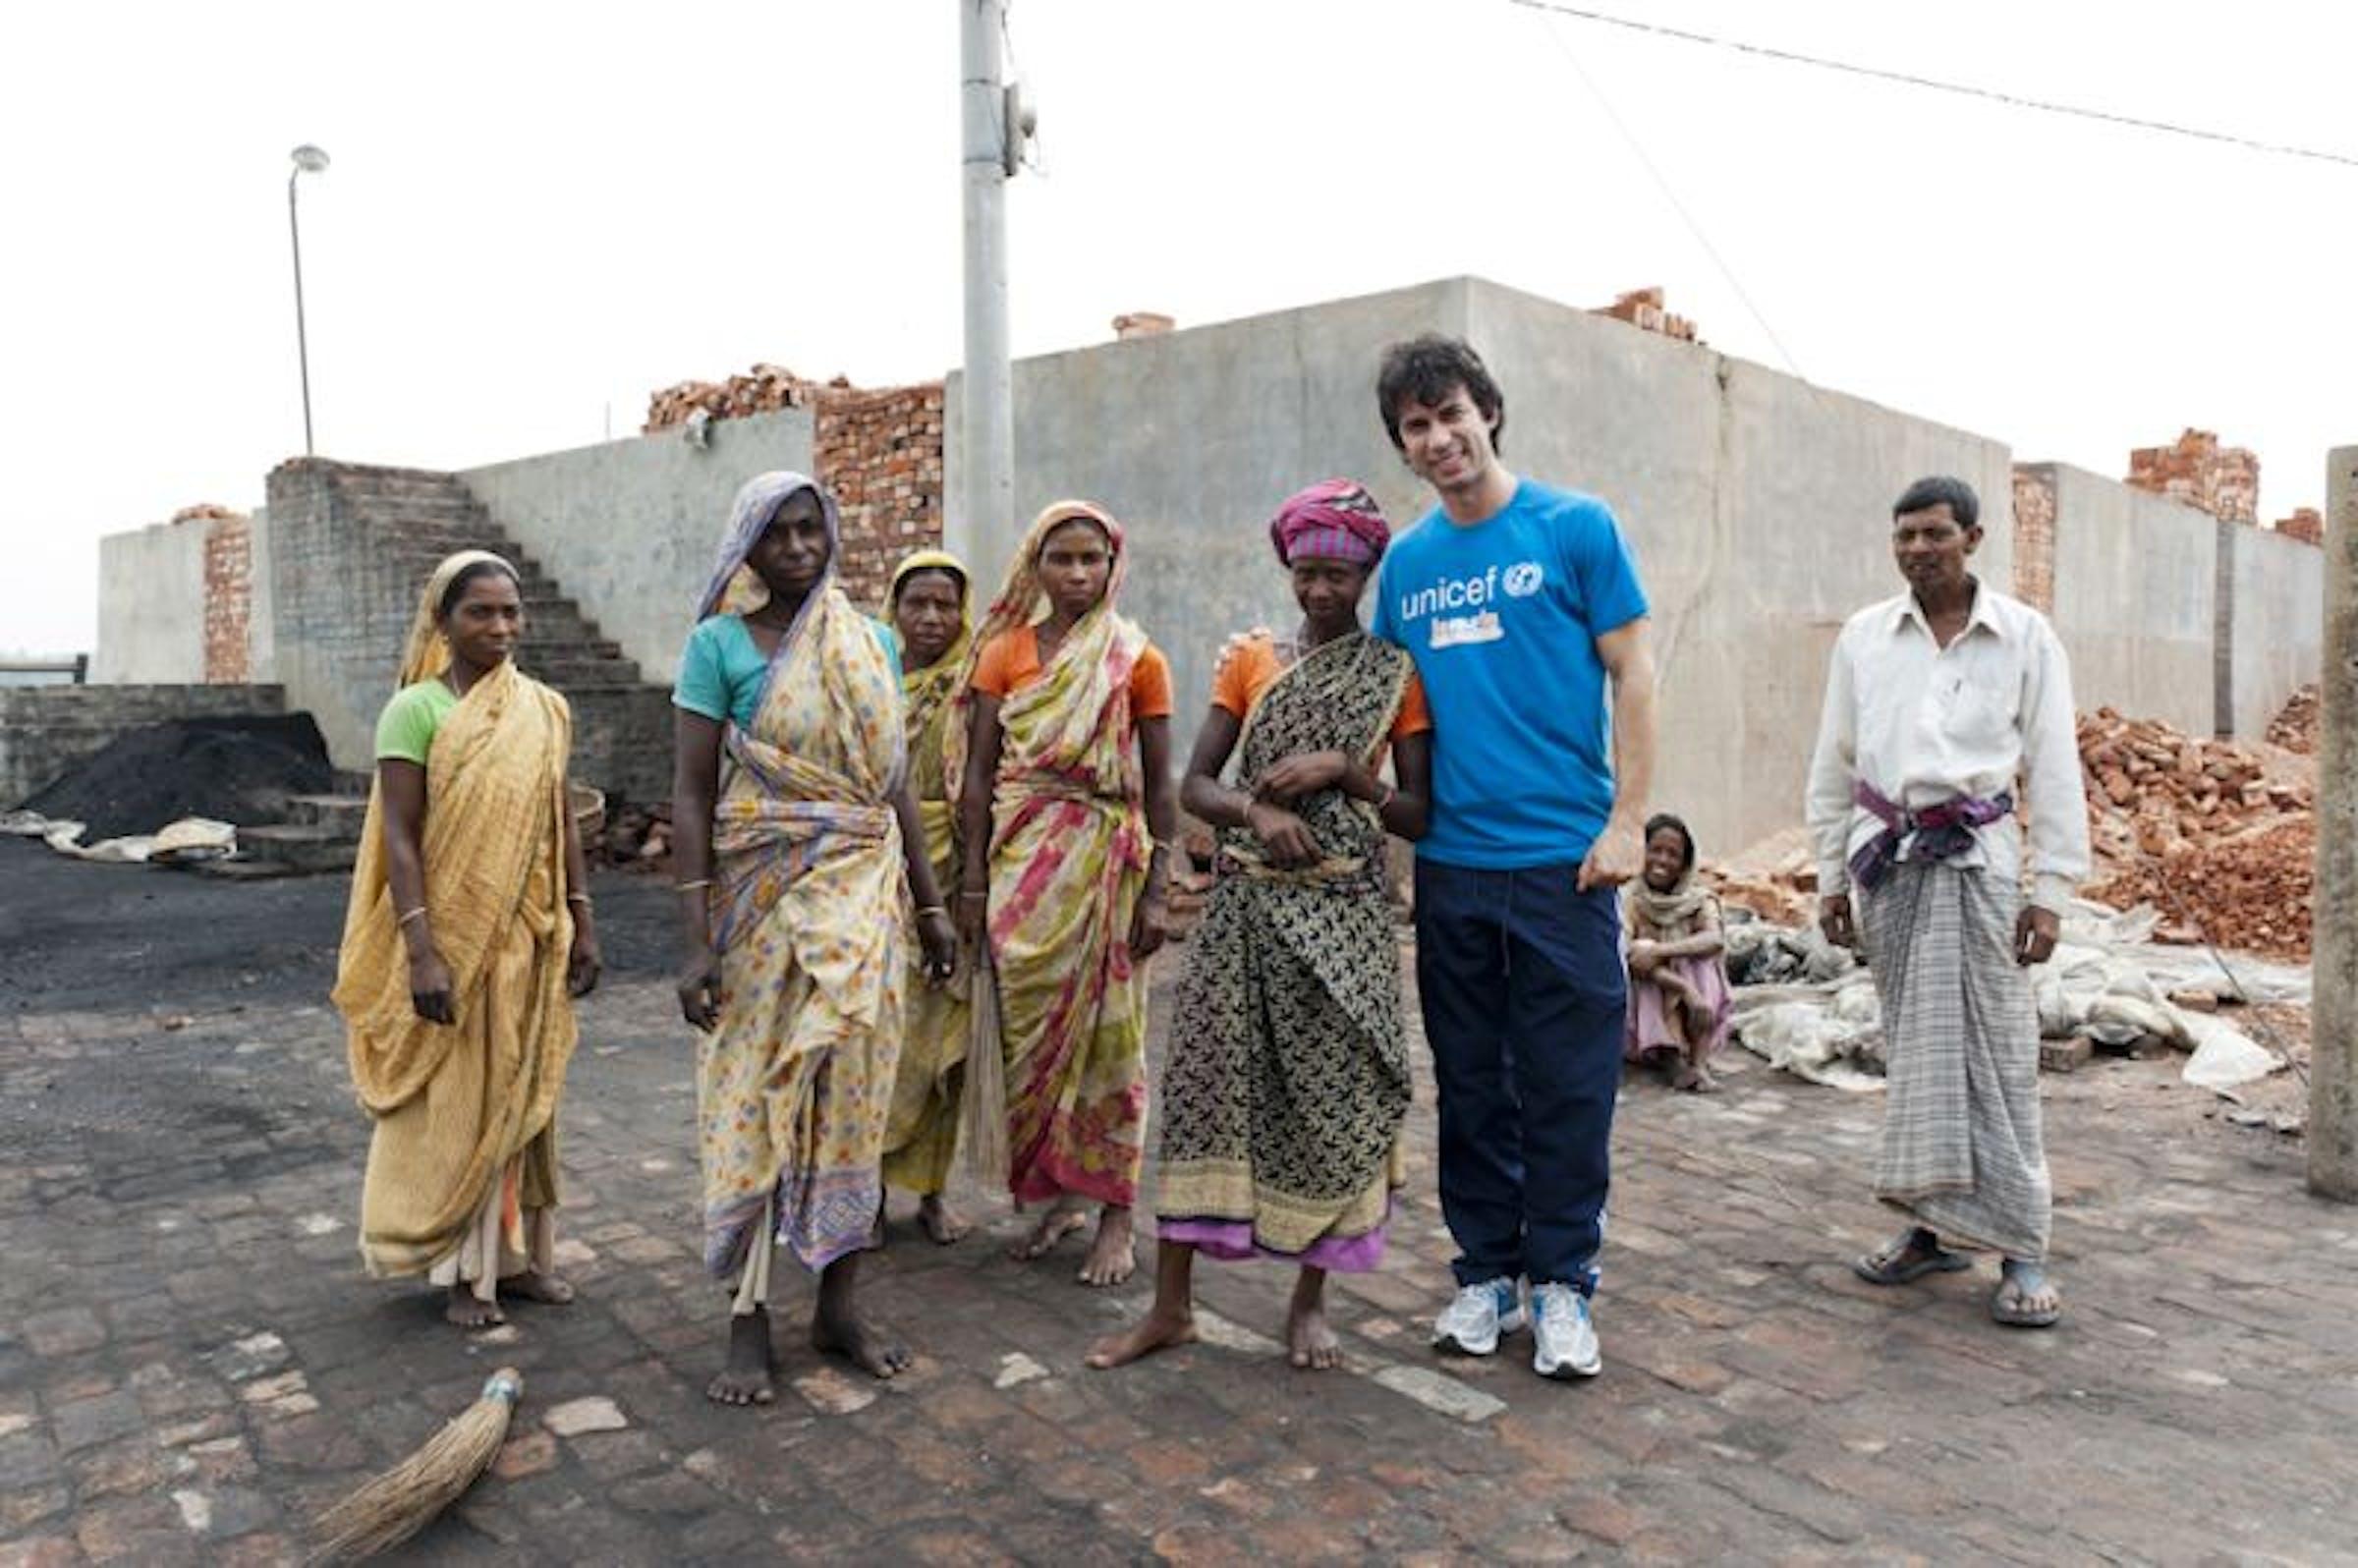 UNICEF/ITAL2011/PACIFICO